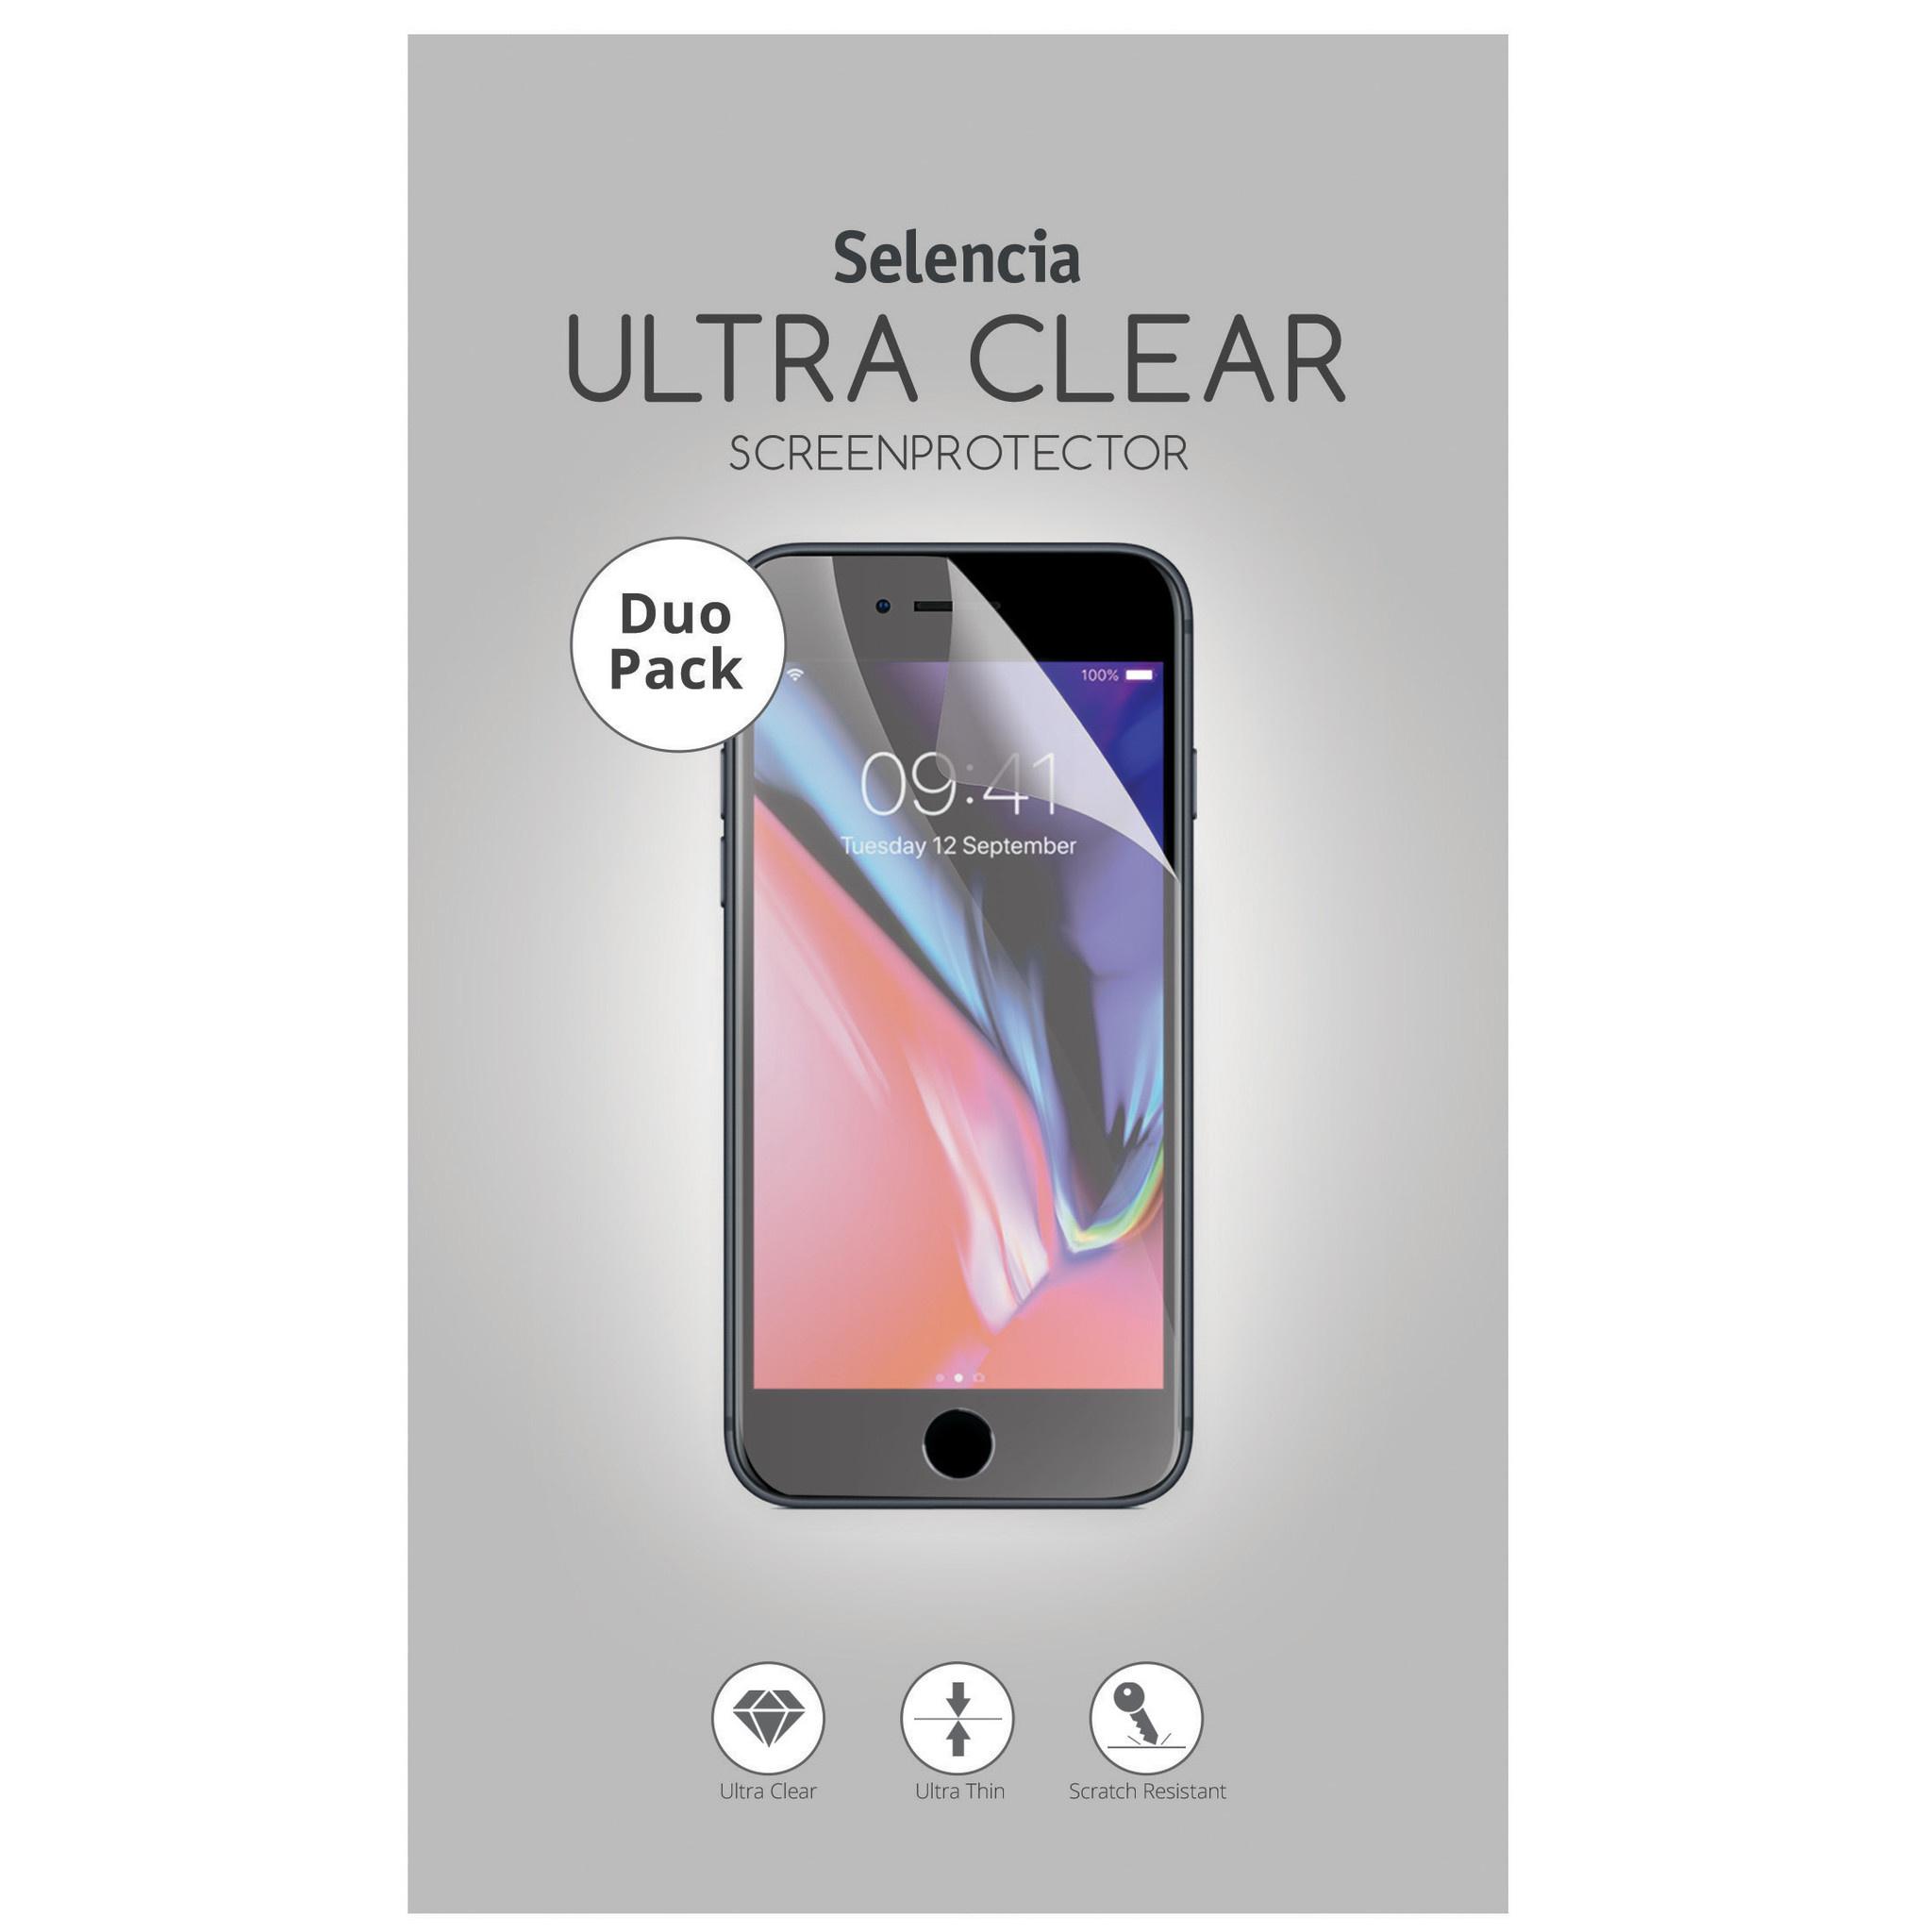 Selencia Duo Pack Screenprotector für das Samsung Galaxy A9 (2018)